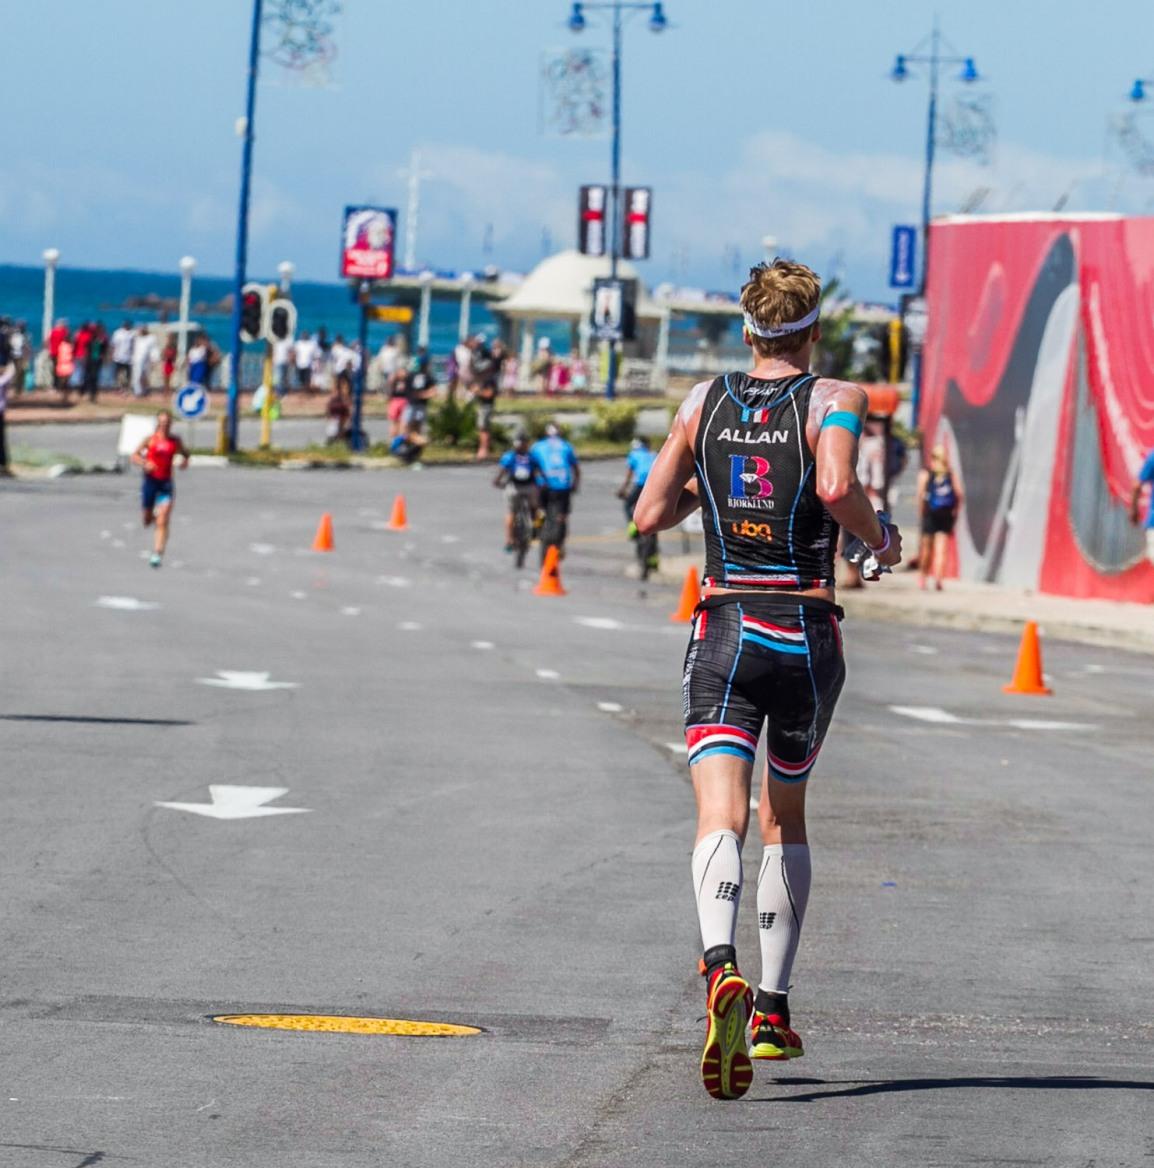 Ironman South Africa - Triallan - Allan Hovda - Humanspeed-4